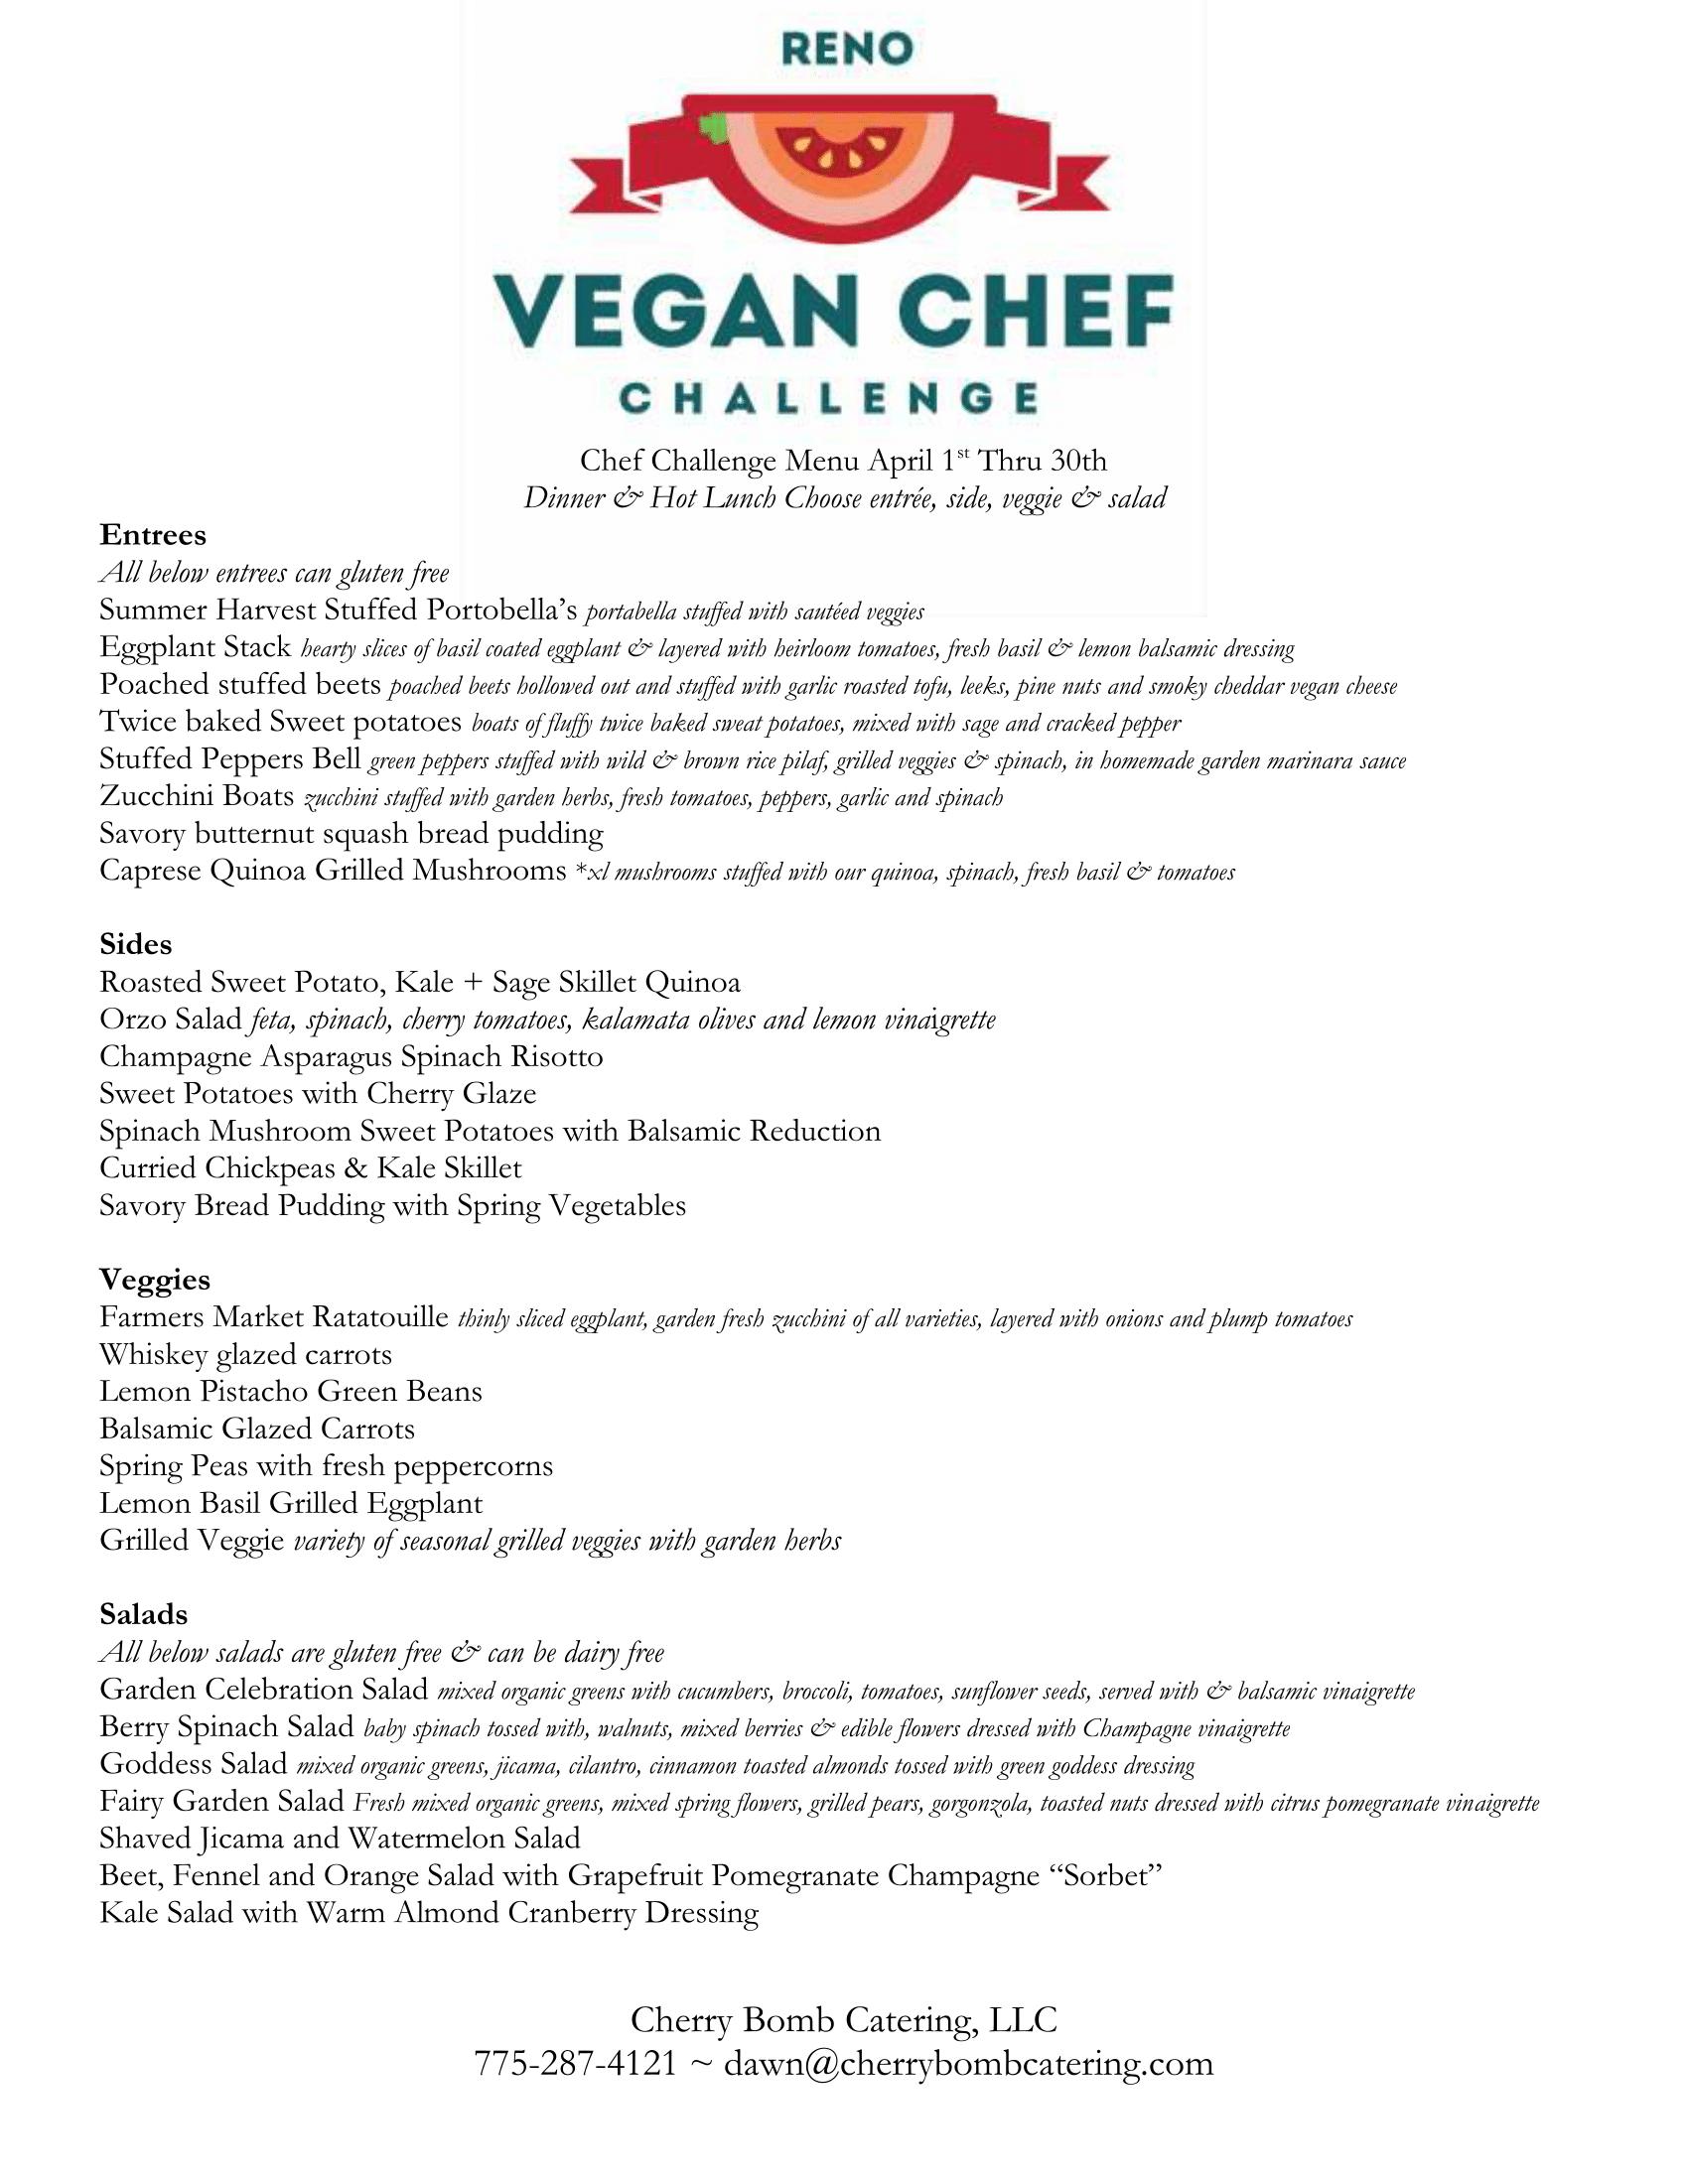 VCC dinner menus-1.png